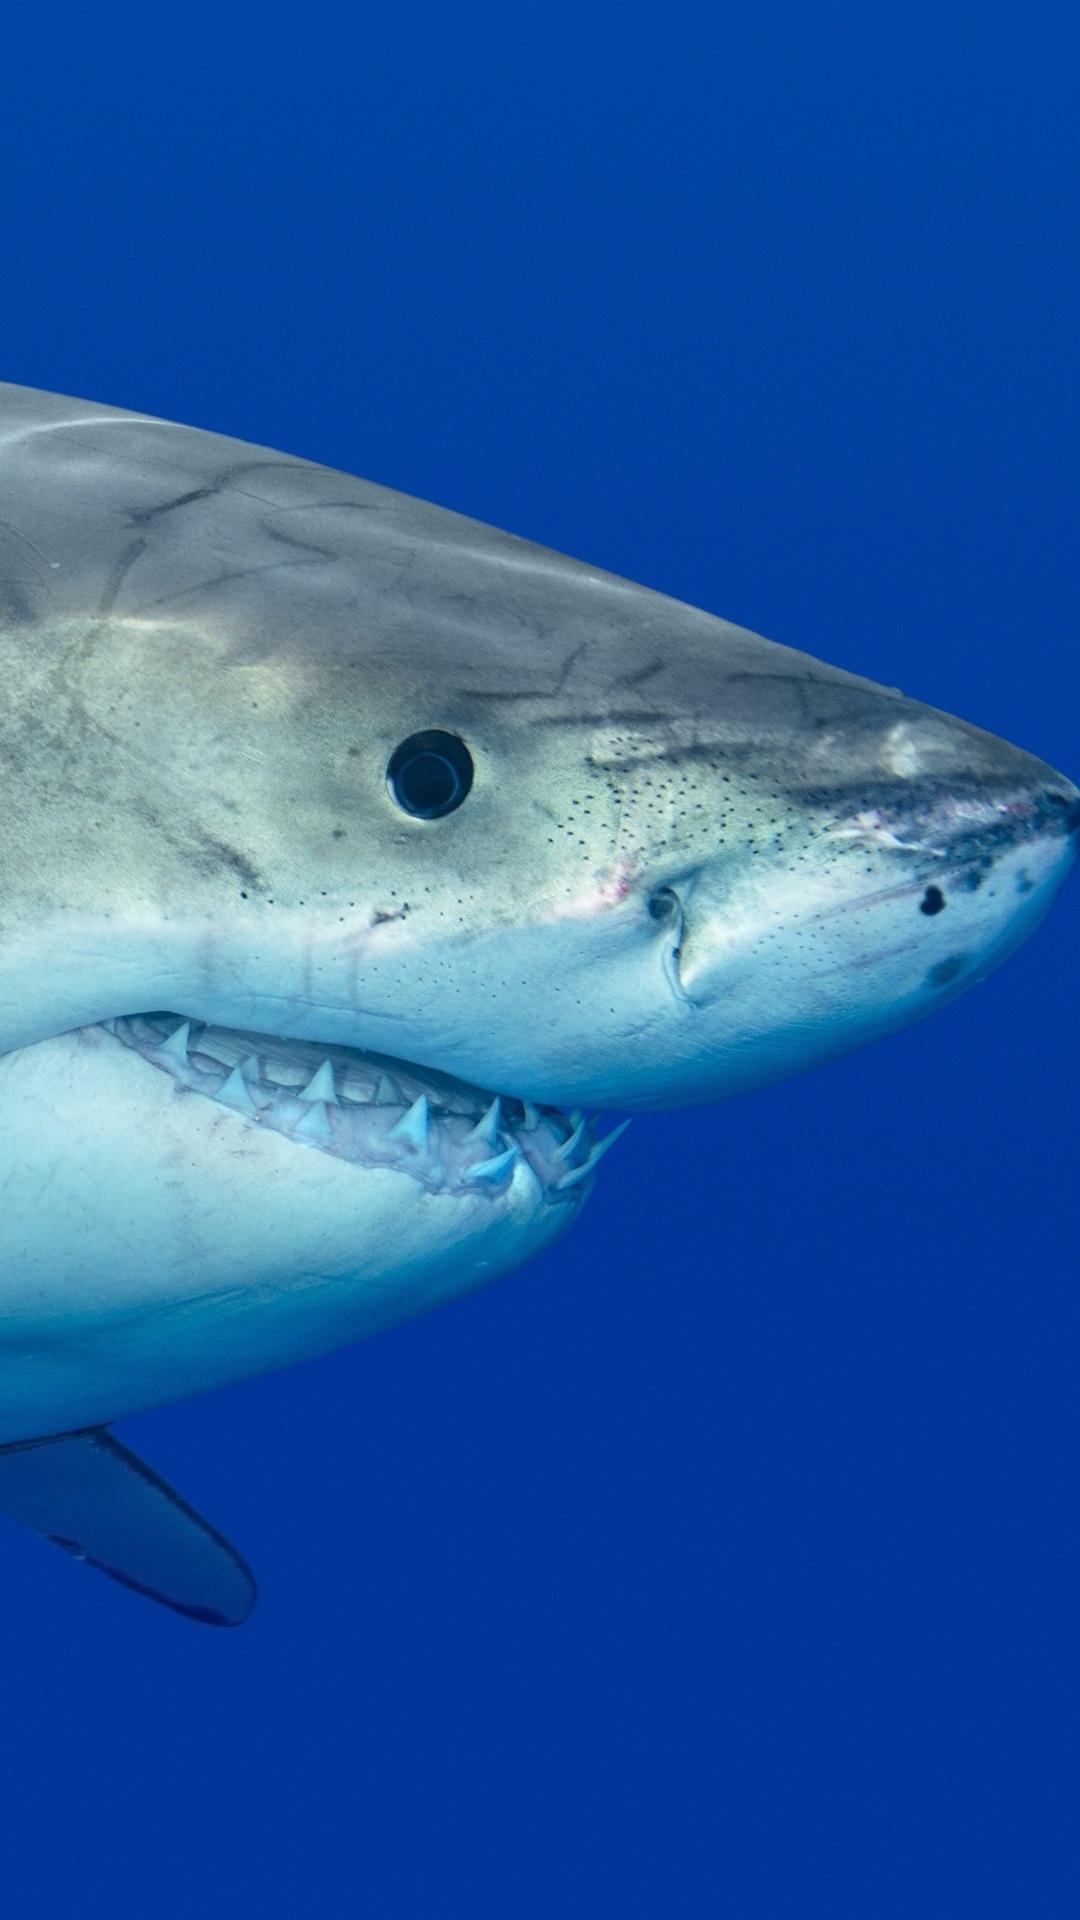 サメ 捕食者 水中 1080x1920 Iphone 8 7 6 6s Plus 壁紙 背景 画像